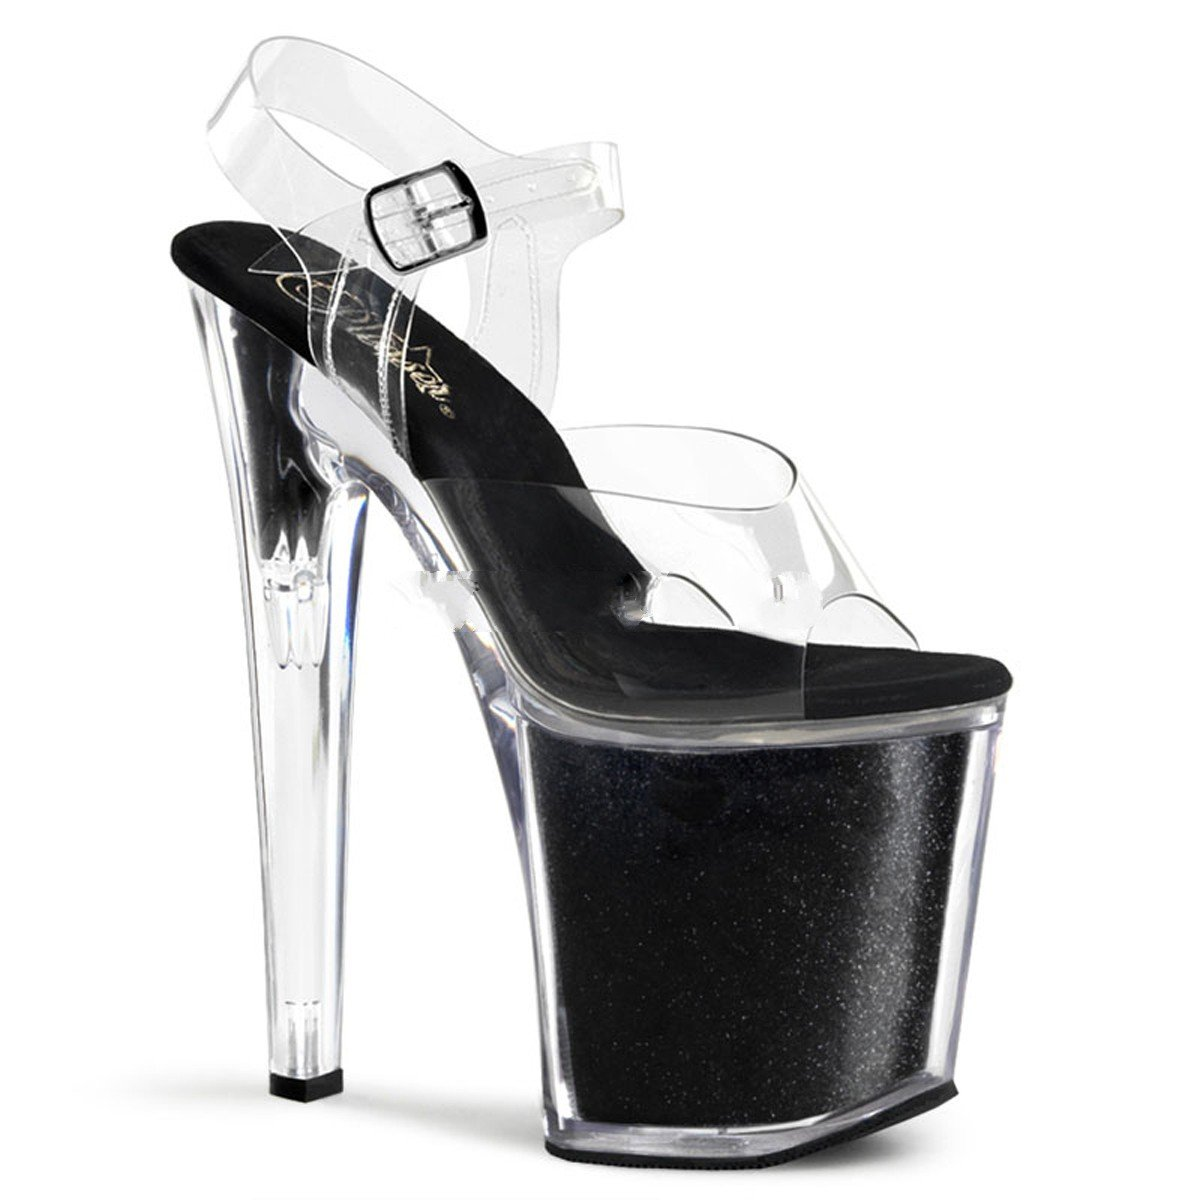 Pleaser Xtreme-808G - Sexy High Heels Extrem Plateau Sandaletten Sandaletten Sandaletten 35-45 Größe EU-39   US-9   UK-6 d547ed